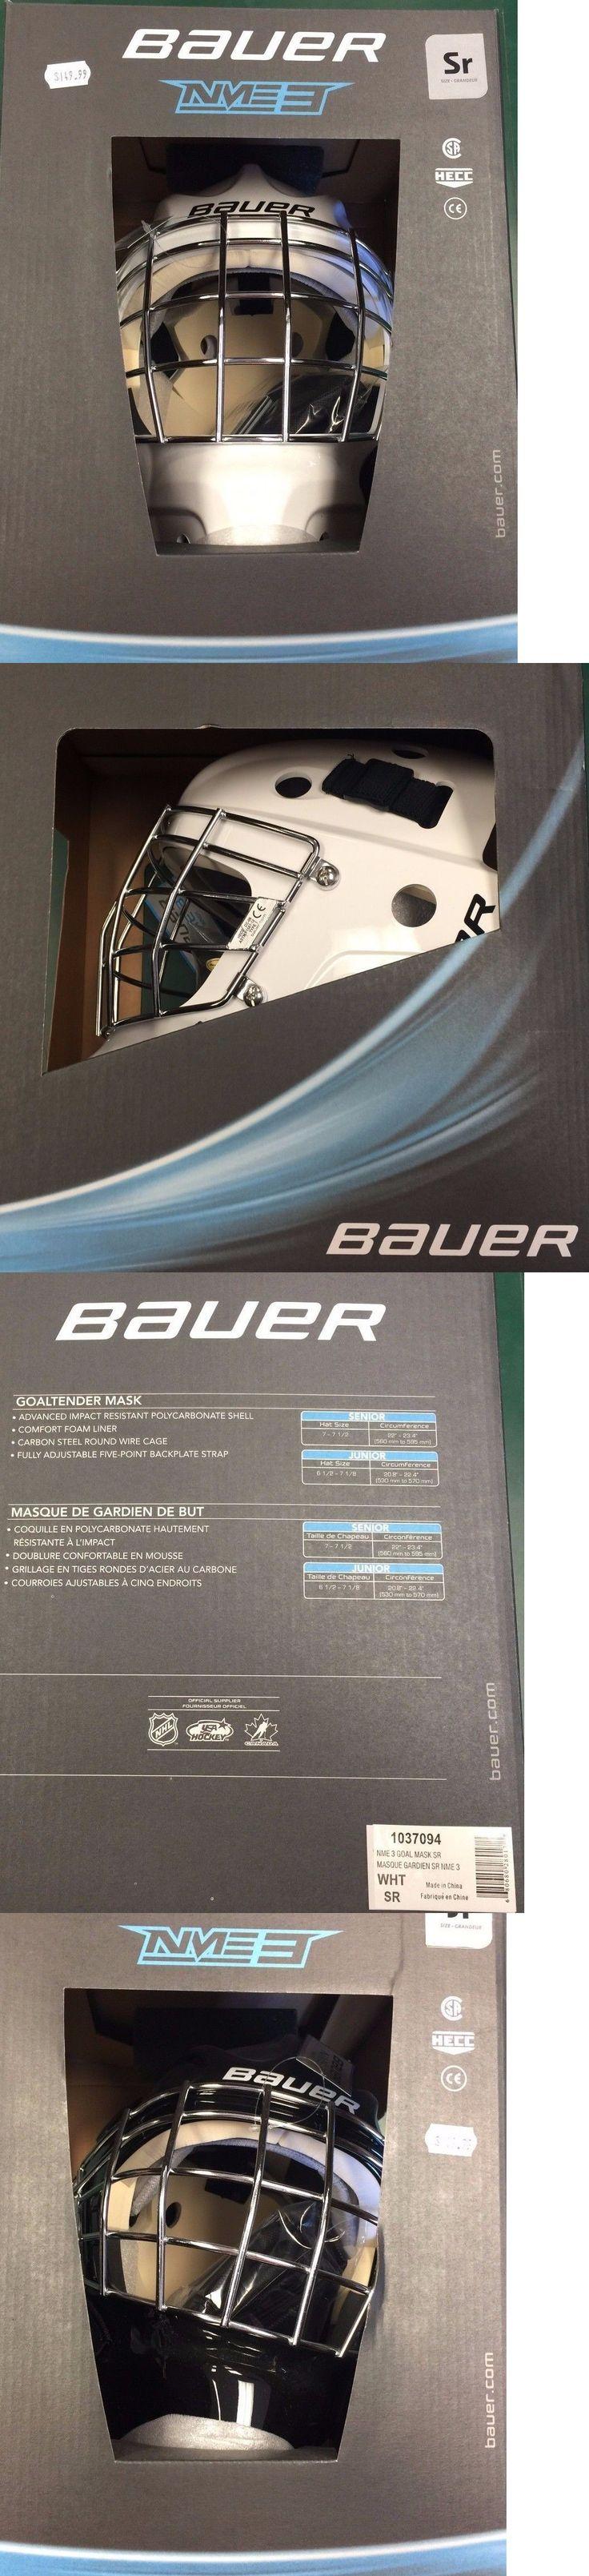 Face Masks 79762: Bauer Nme3 Goaltender Mask -> BUY IT NOW ONLY: $144.95 on eBay!